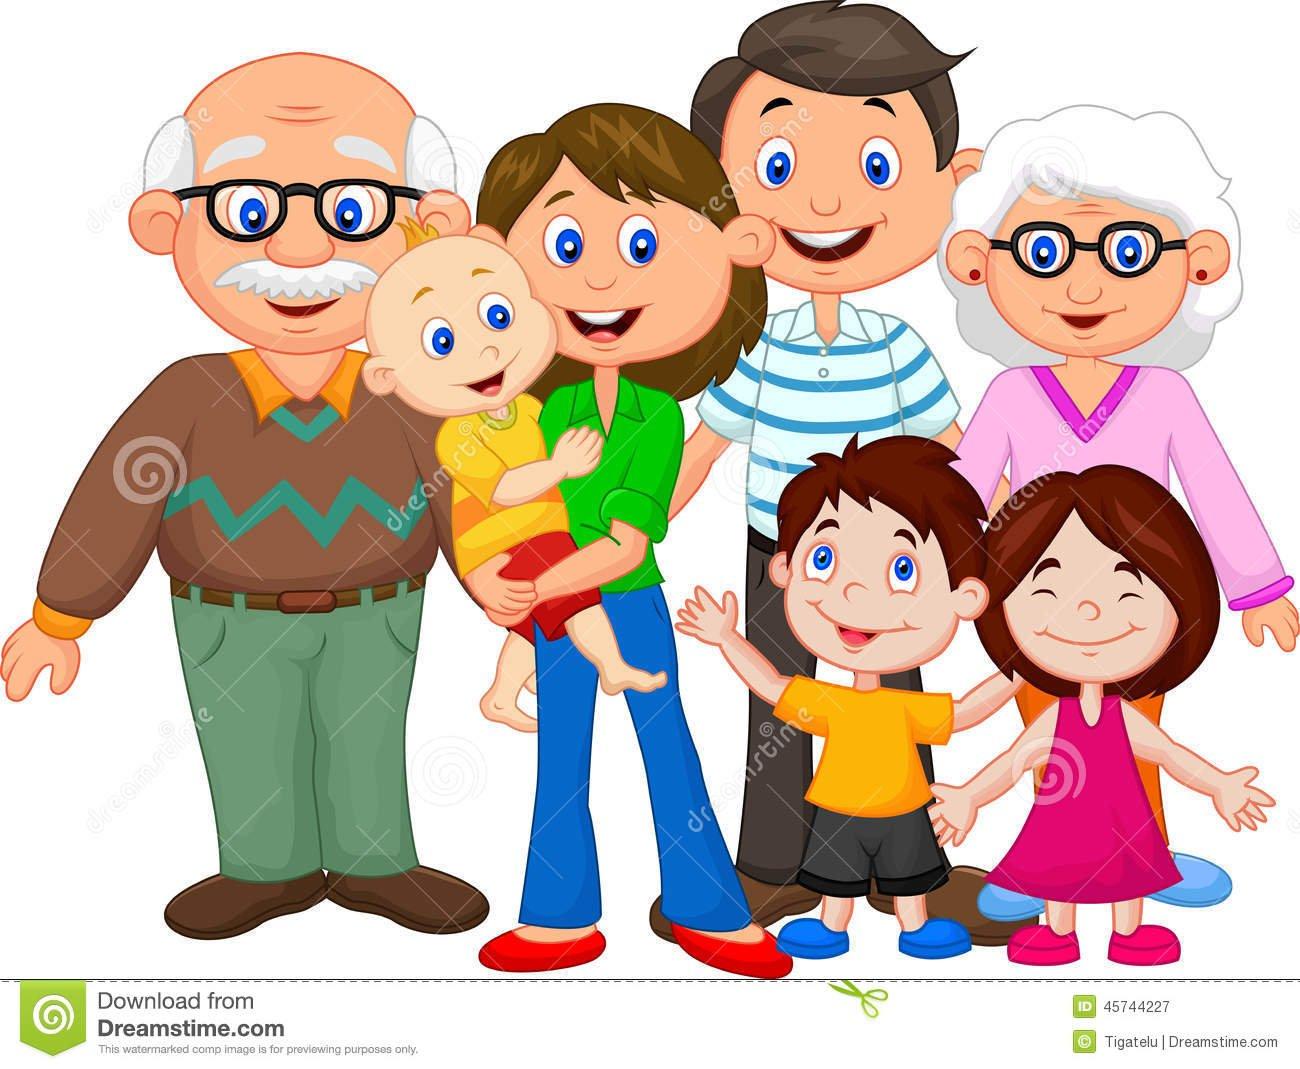 Familia with regard to desenho familia feliz